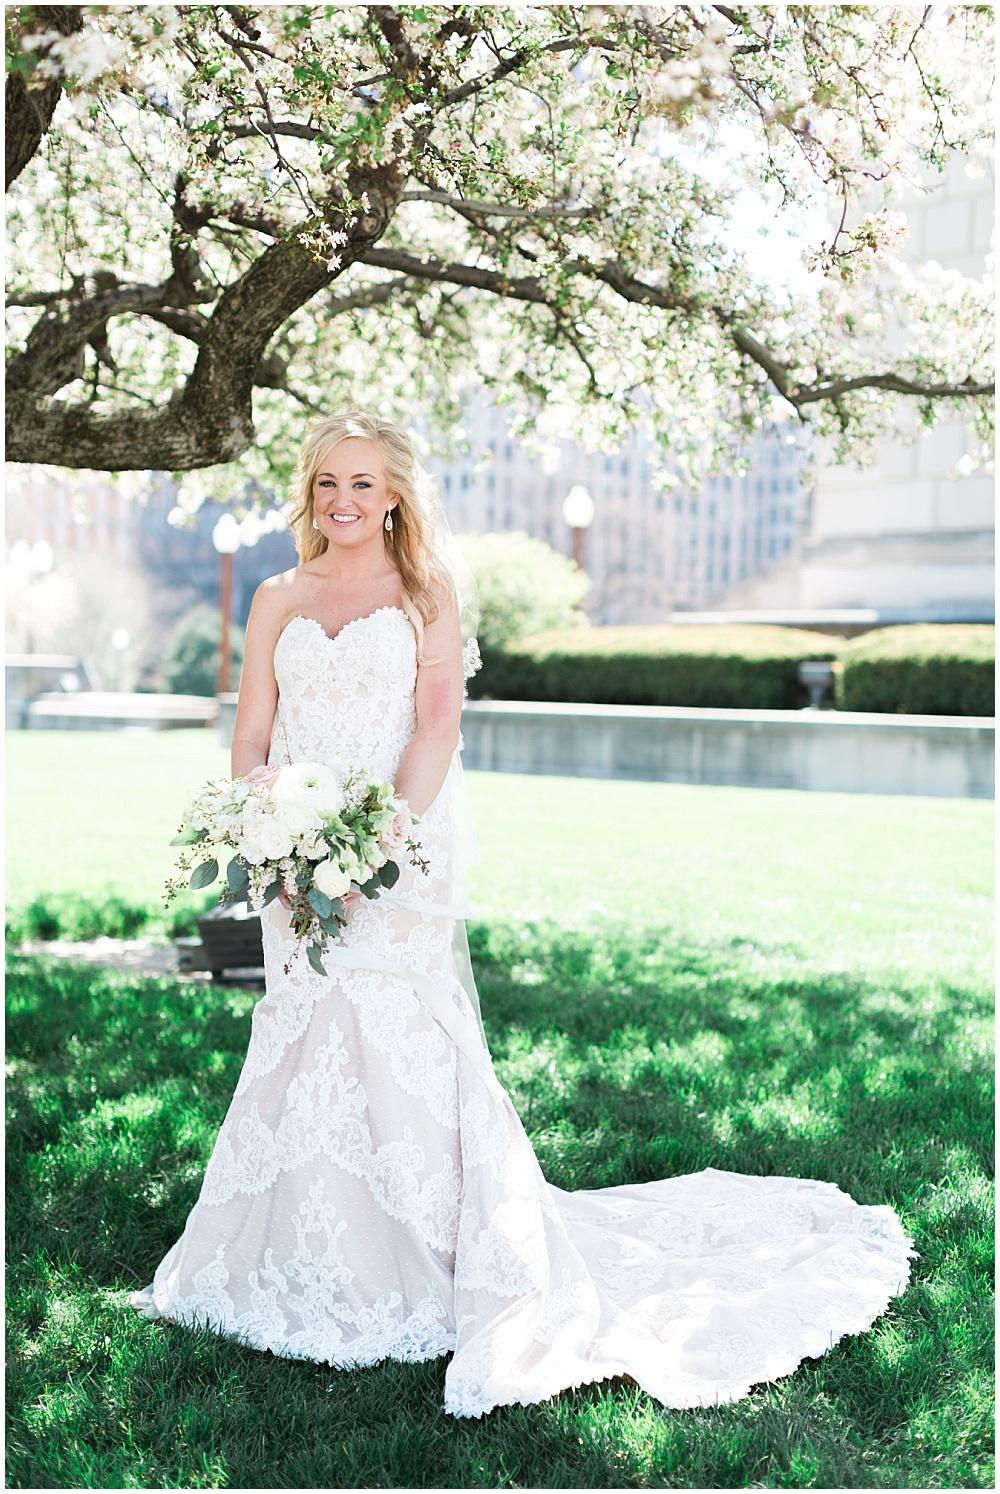 Union Station Wedding | Melanie + Chris - Jessica Dum Wedding ...